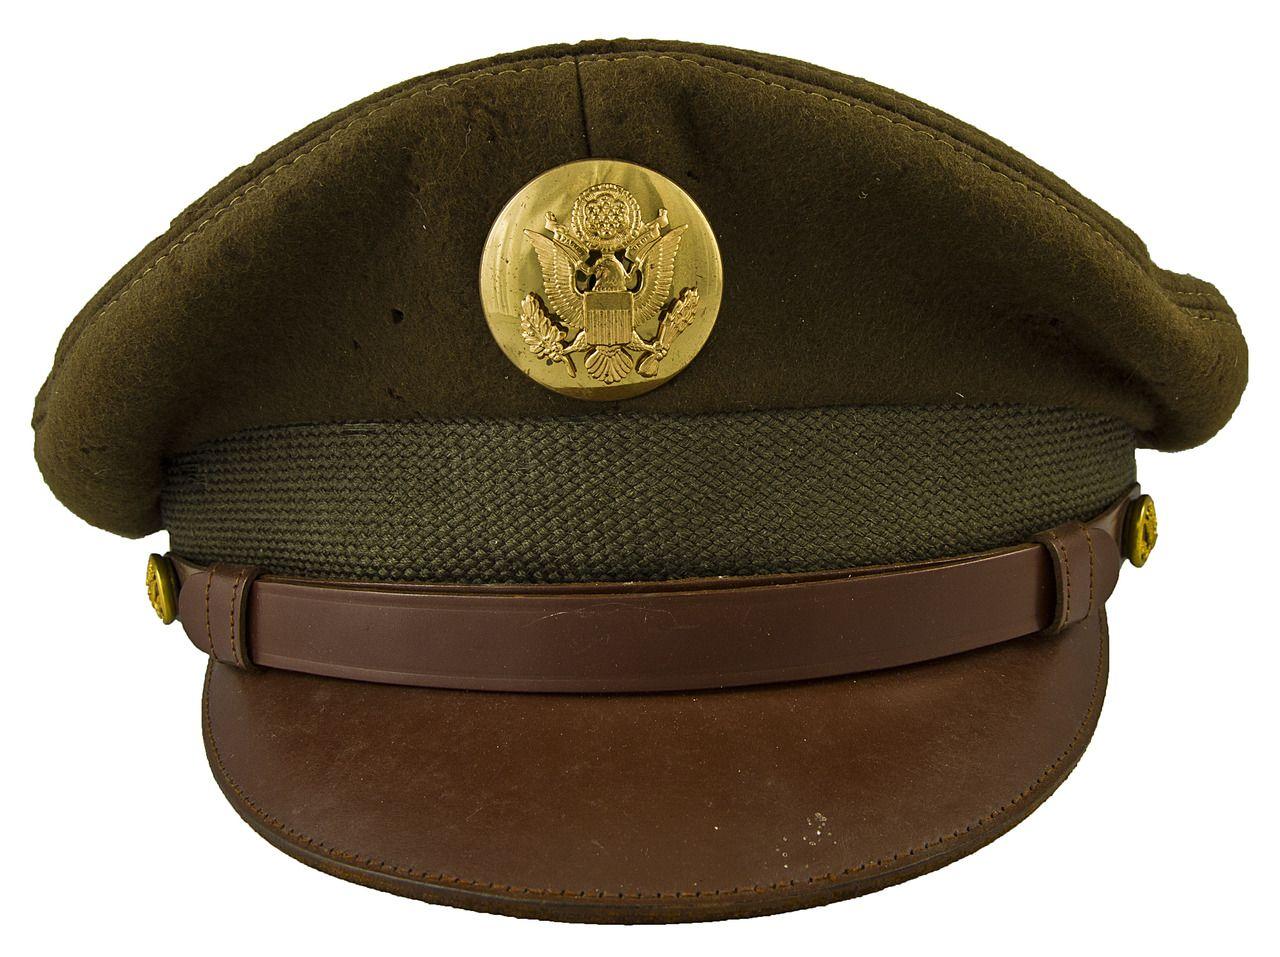 07cd69bdd10 U.S. Army Enlisted Man s Visor Hat